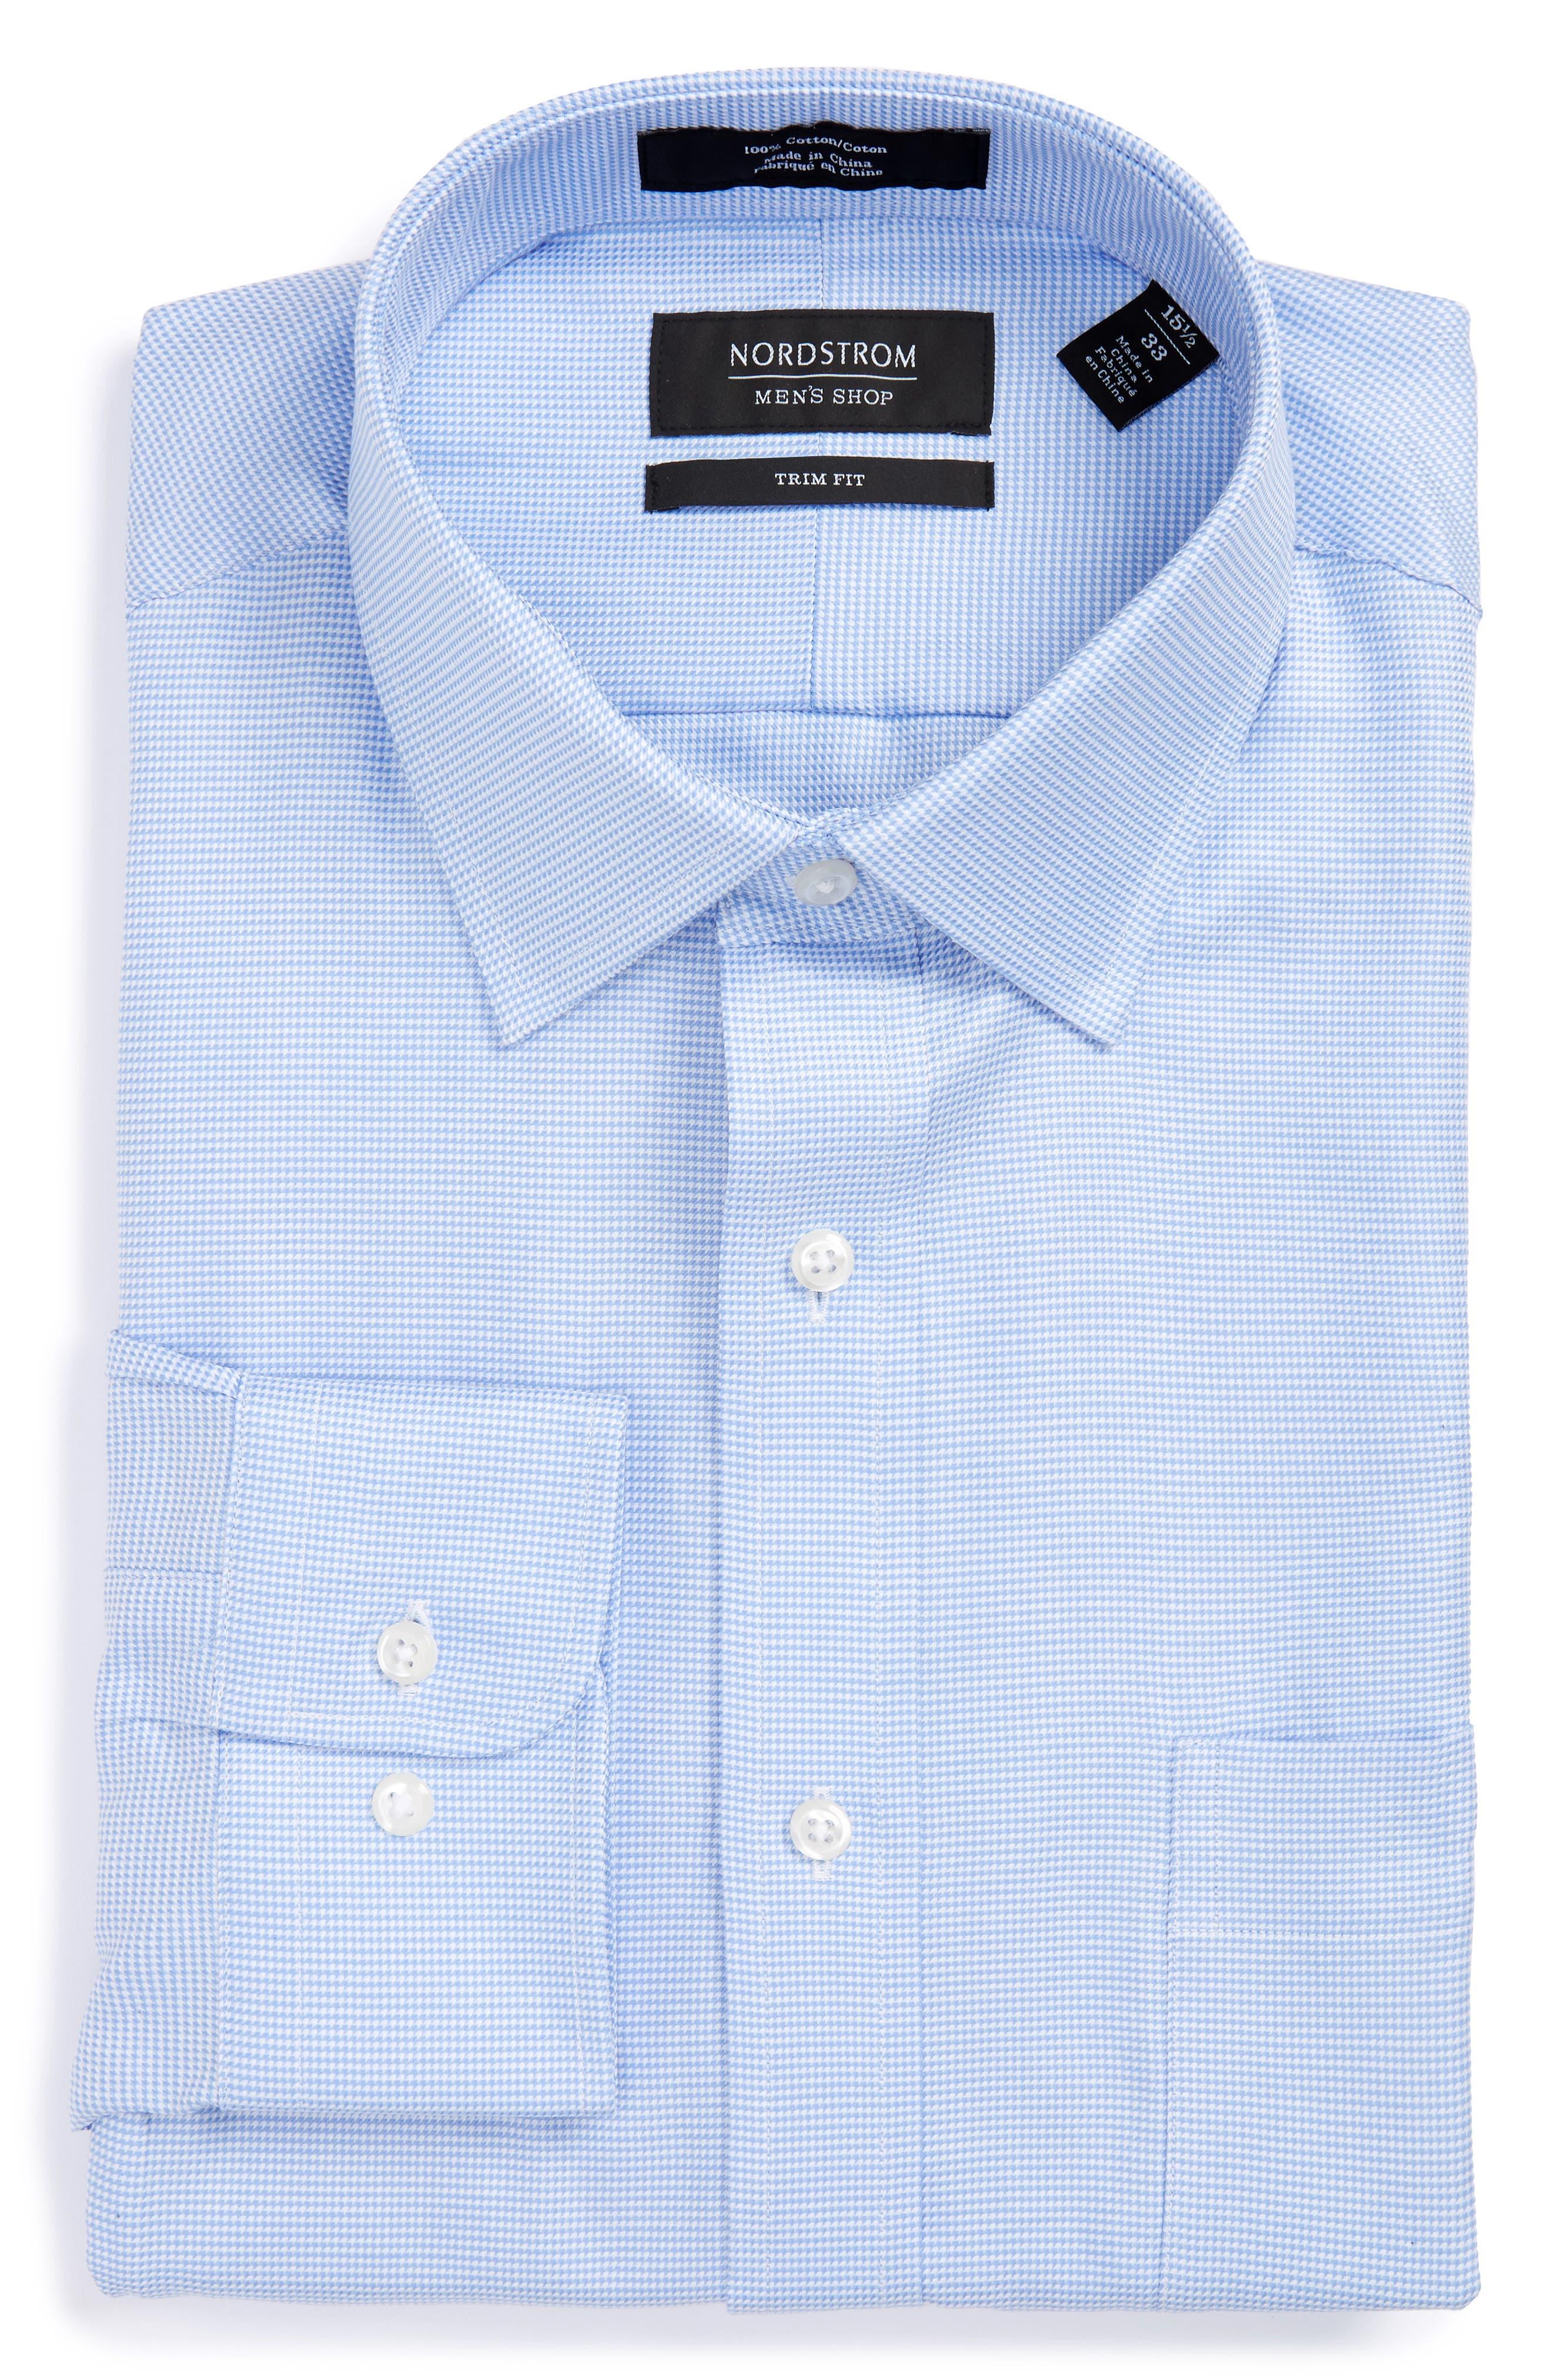 Nordstrom Men's Shop Trim Fit Textured Dress Shirt